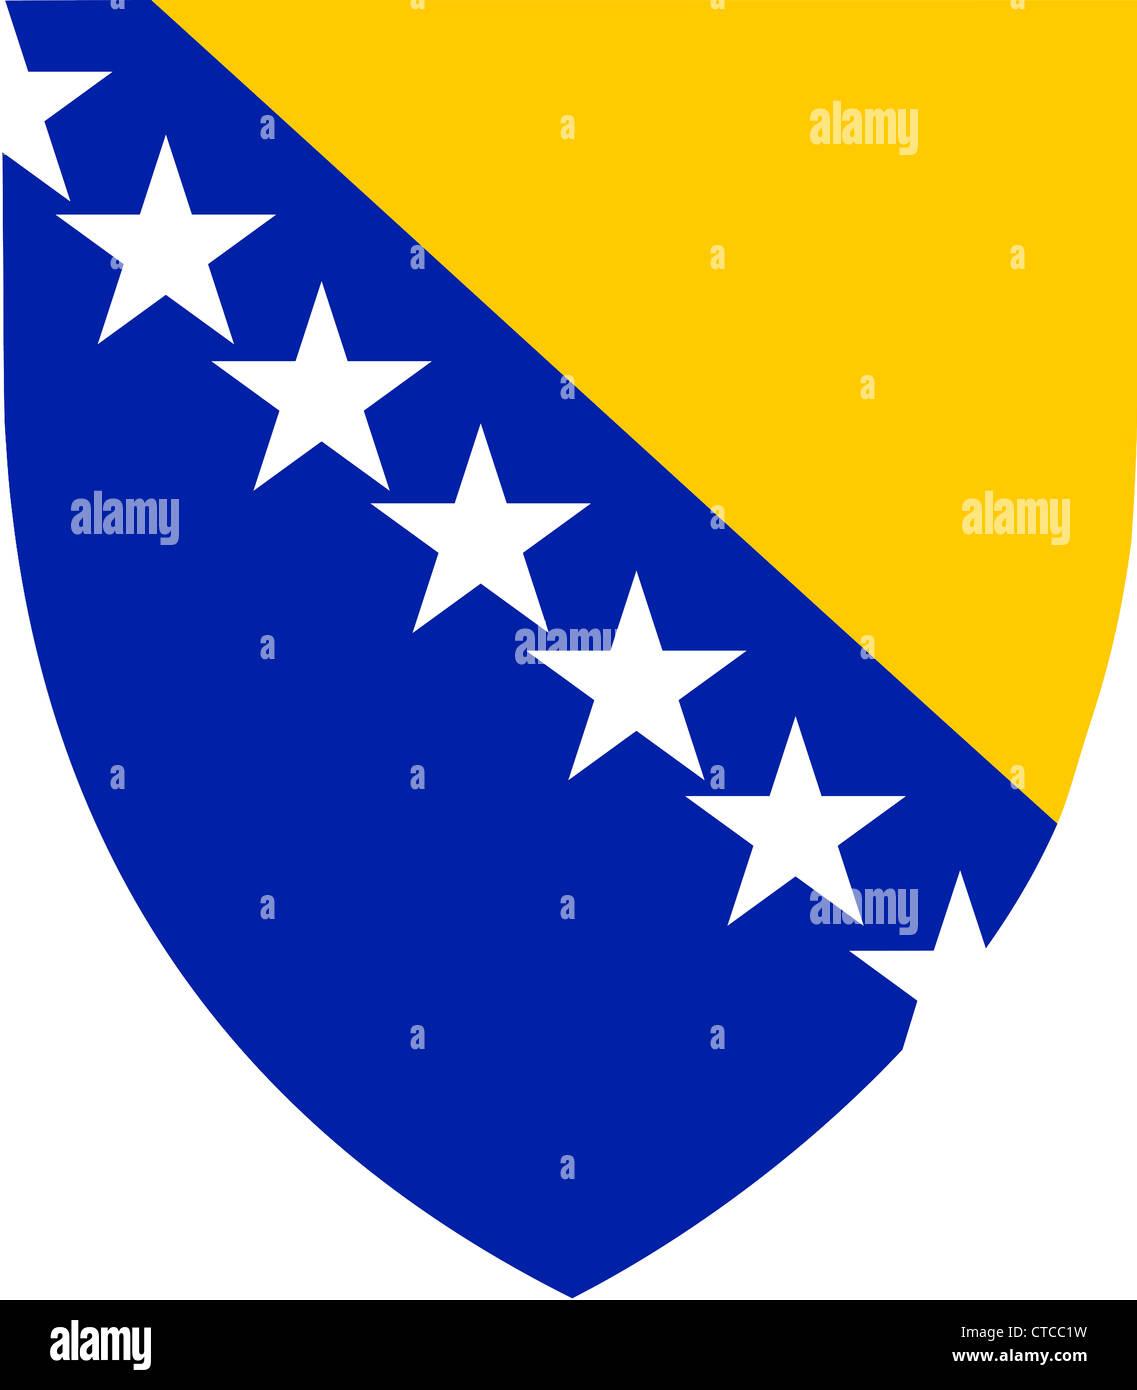 Coat of arms of Bosnia and Herzegovina. - Stock Image